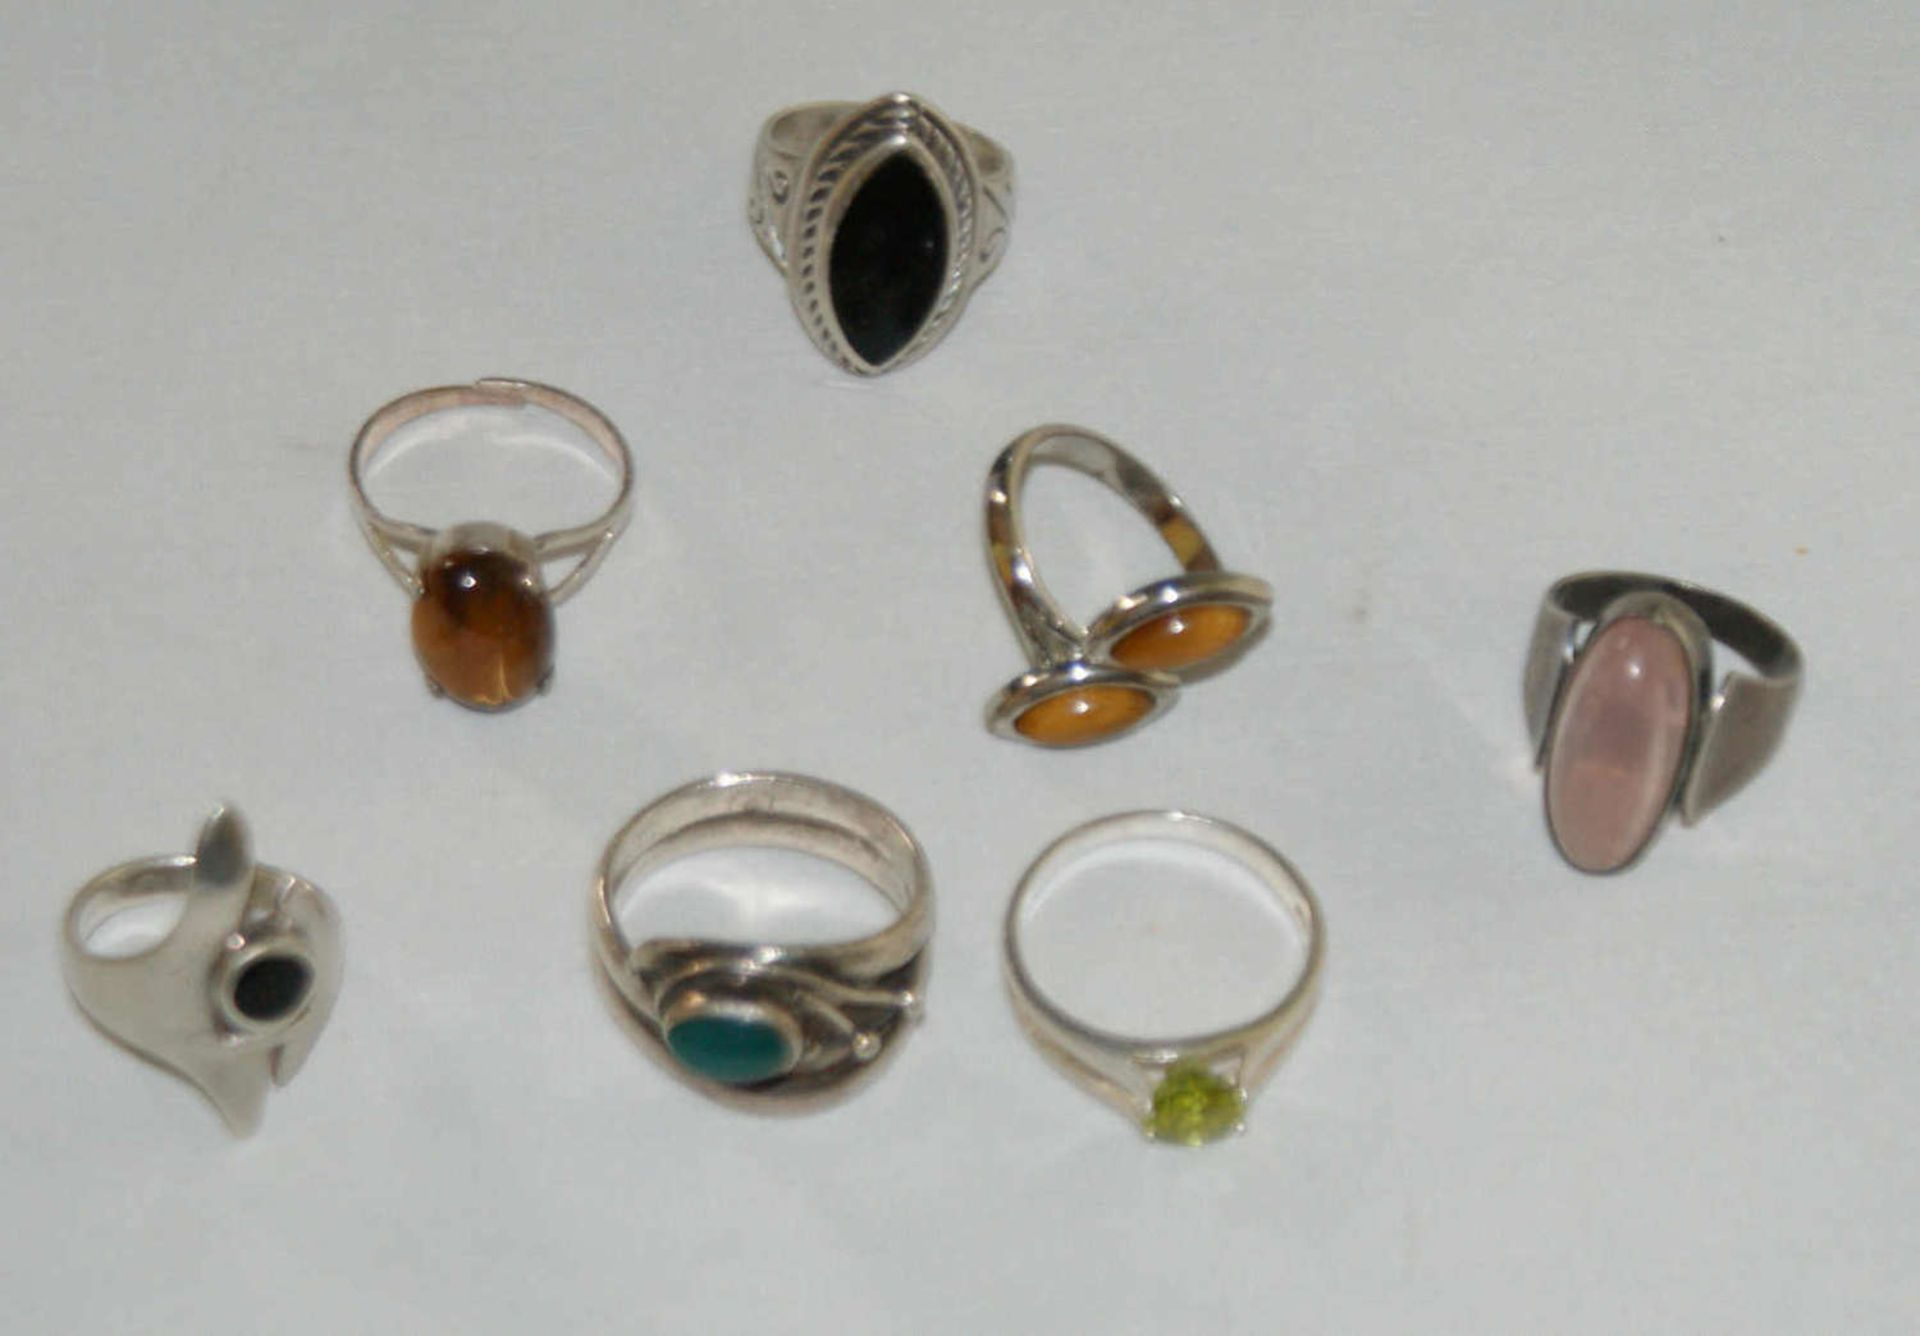 Konvolut Ringe, Silber, besetzt mit z.B. Tigerauge, Rosenquarz, Onyx etc. Insgesamt 7 Stück.